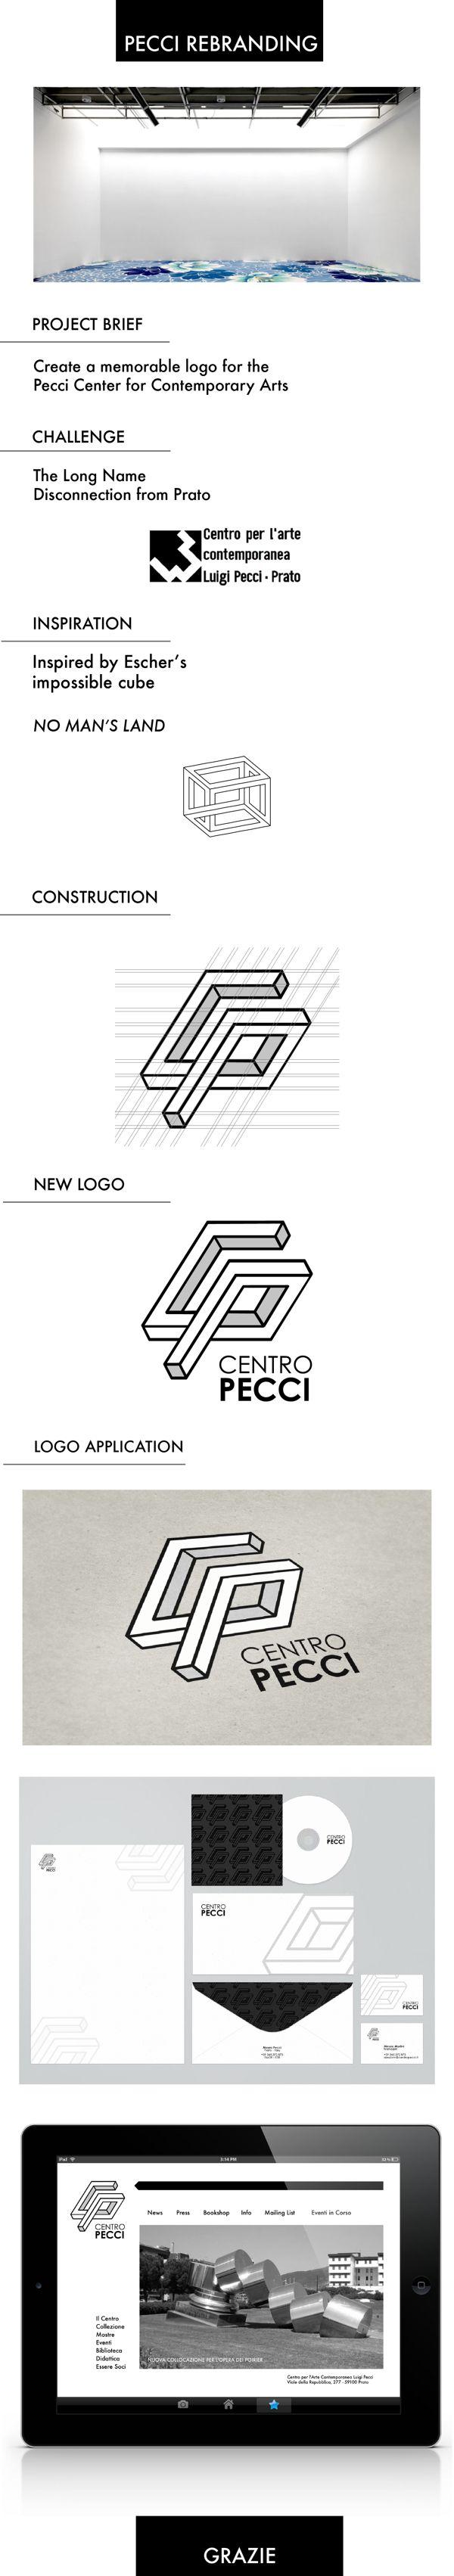 Rebranding Centro Pecci by Nagla Gaafar, via Behance